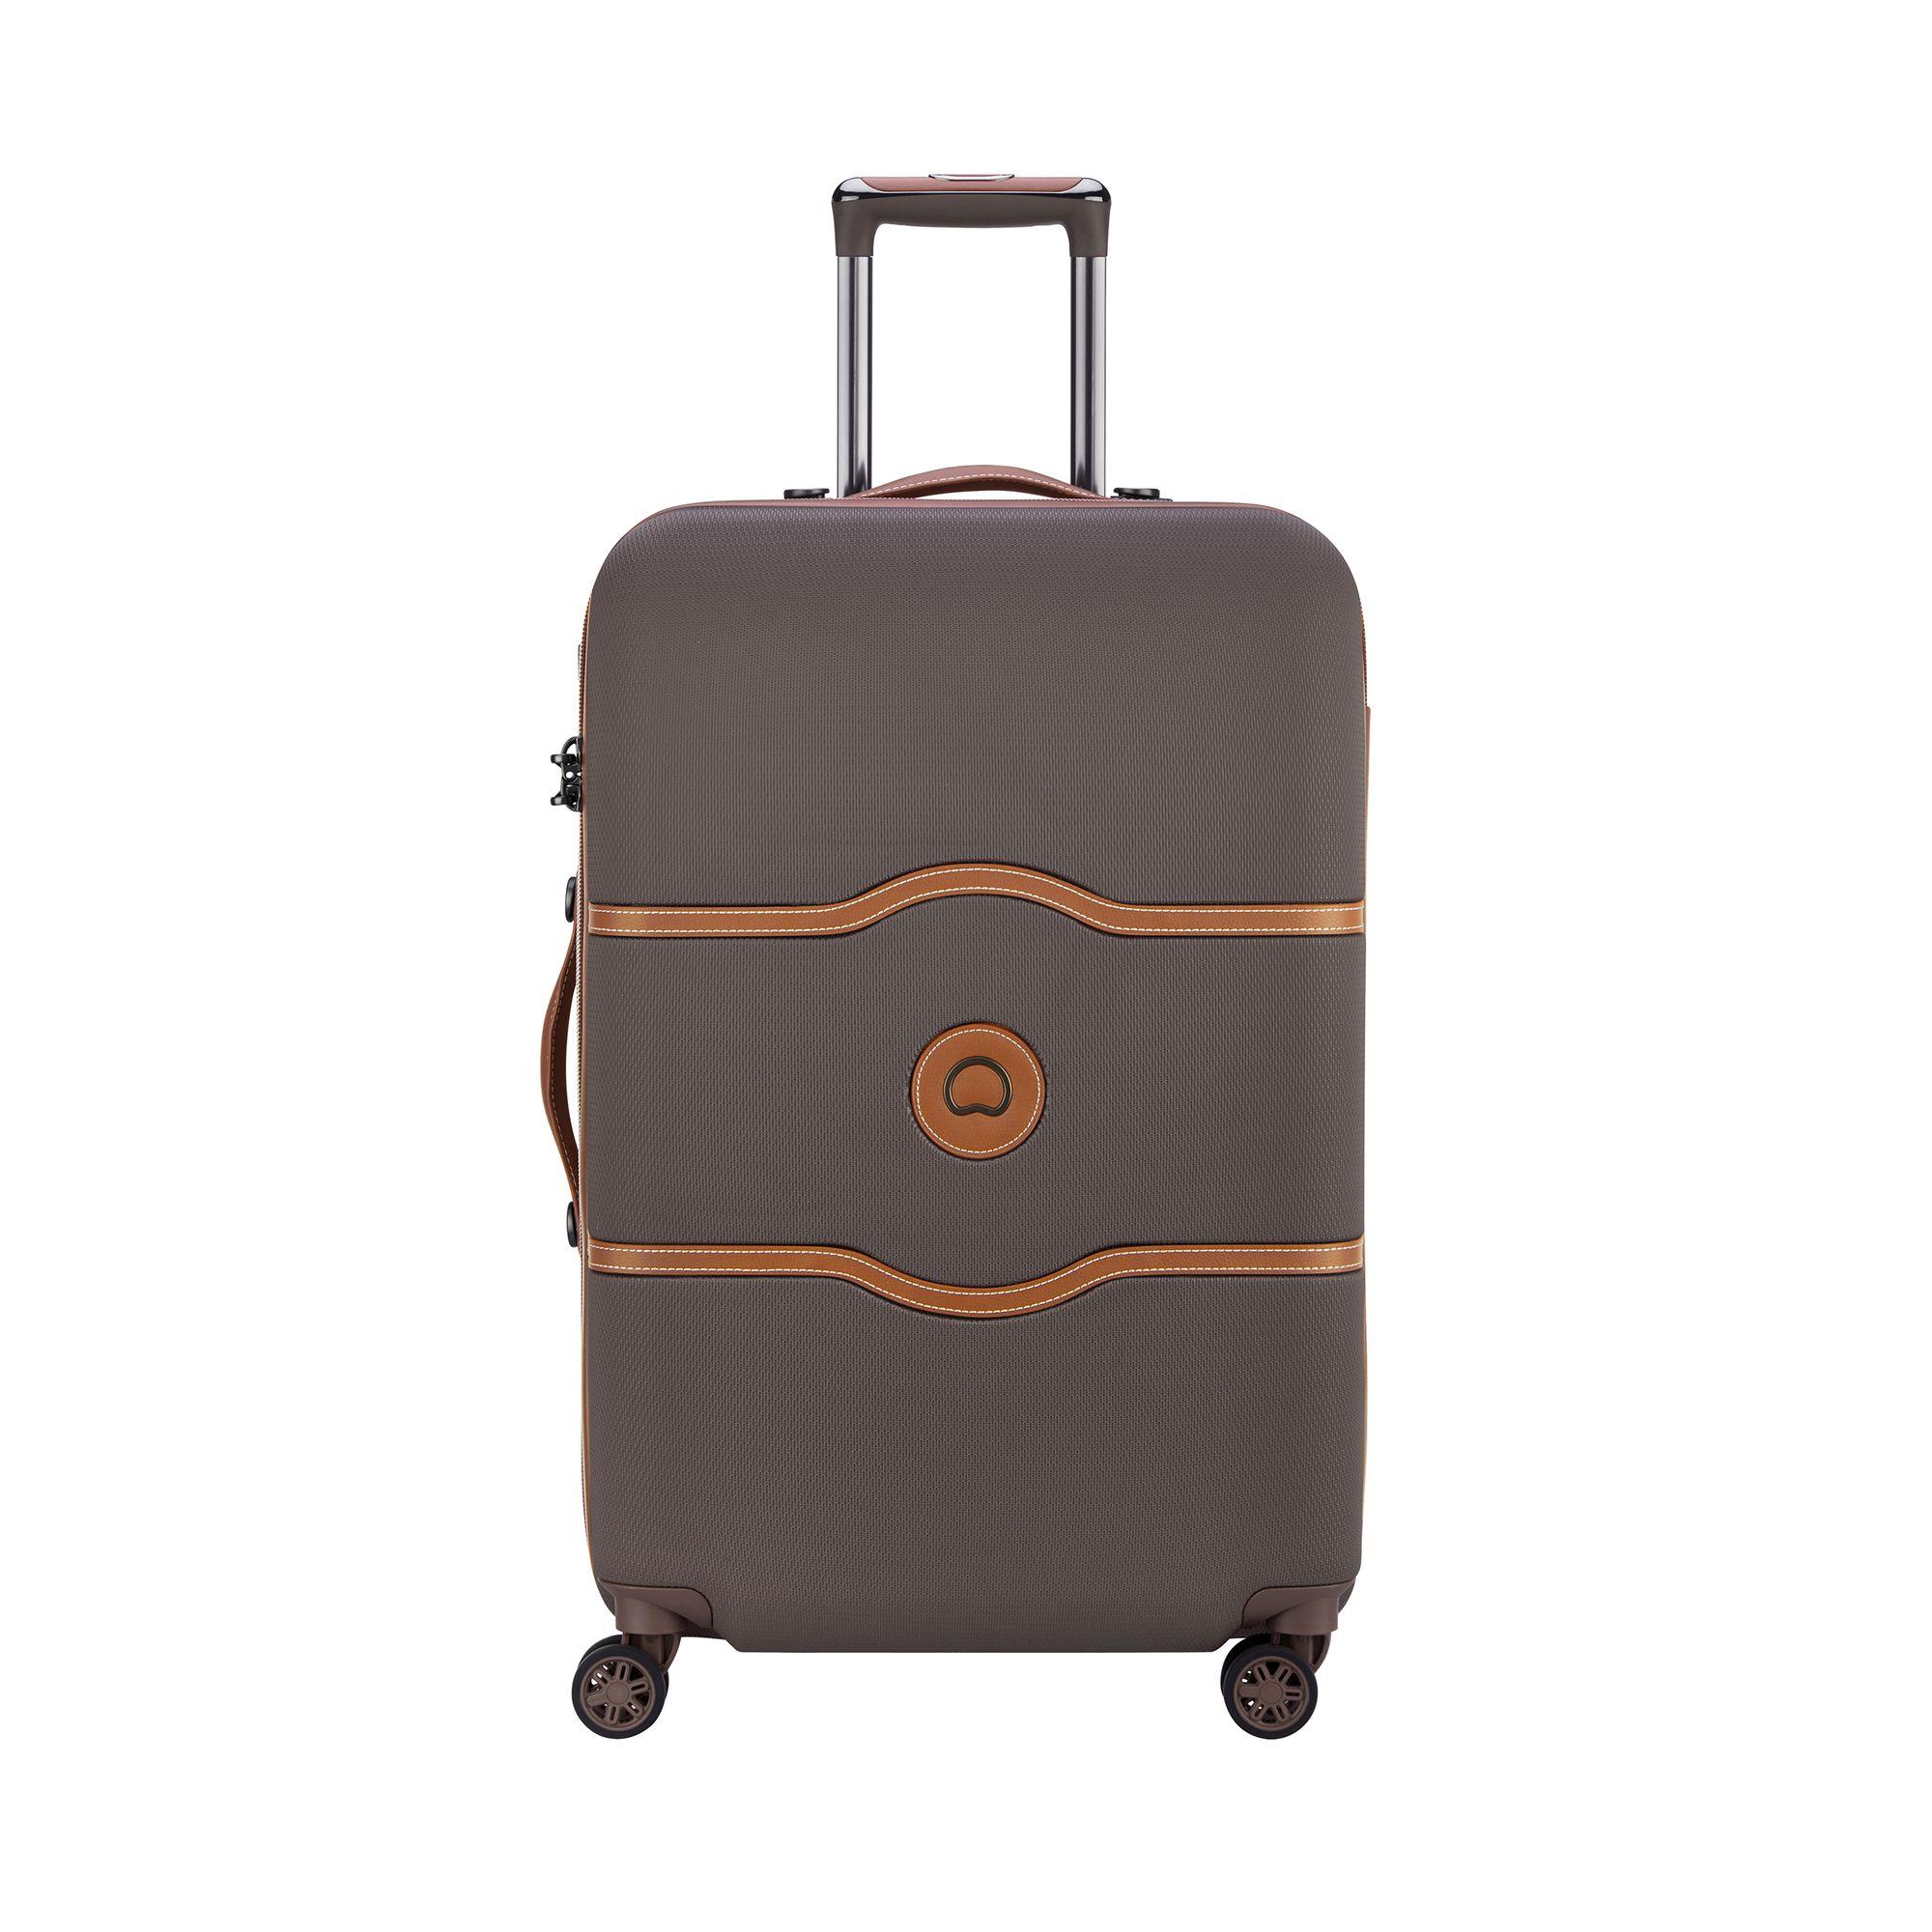 Desley Chatelet Air hård resväska, 4 hjul, 69 cm, Brun